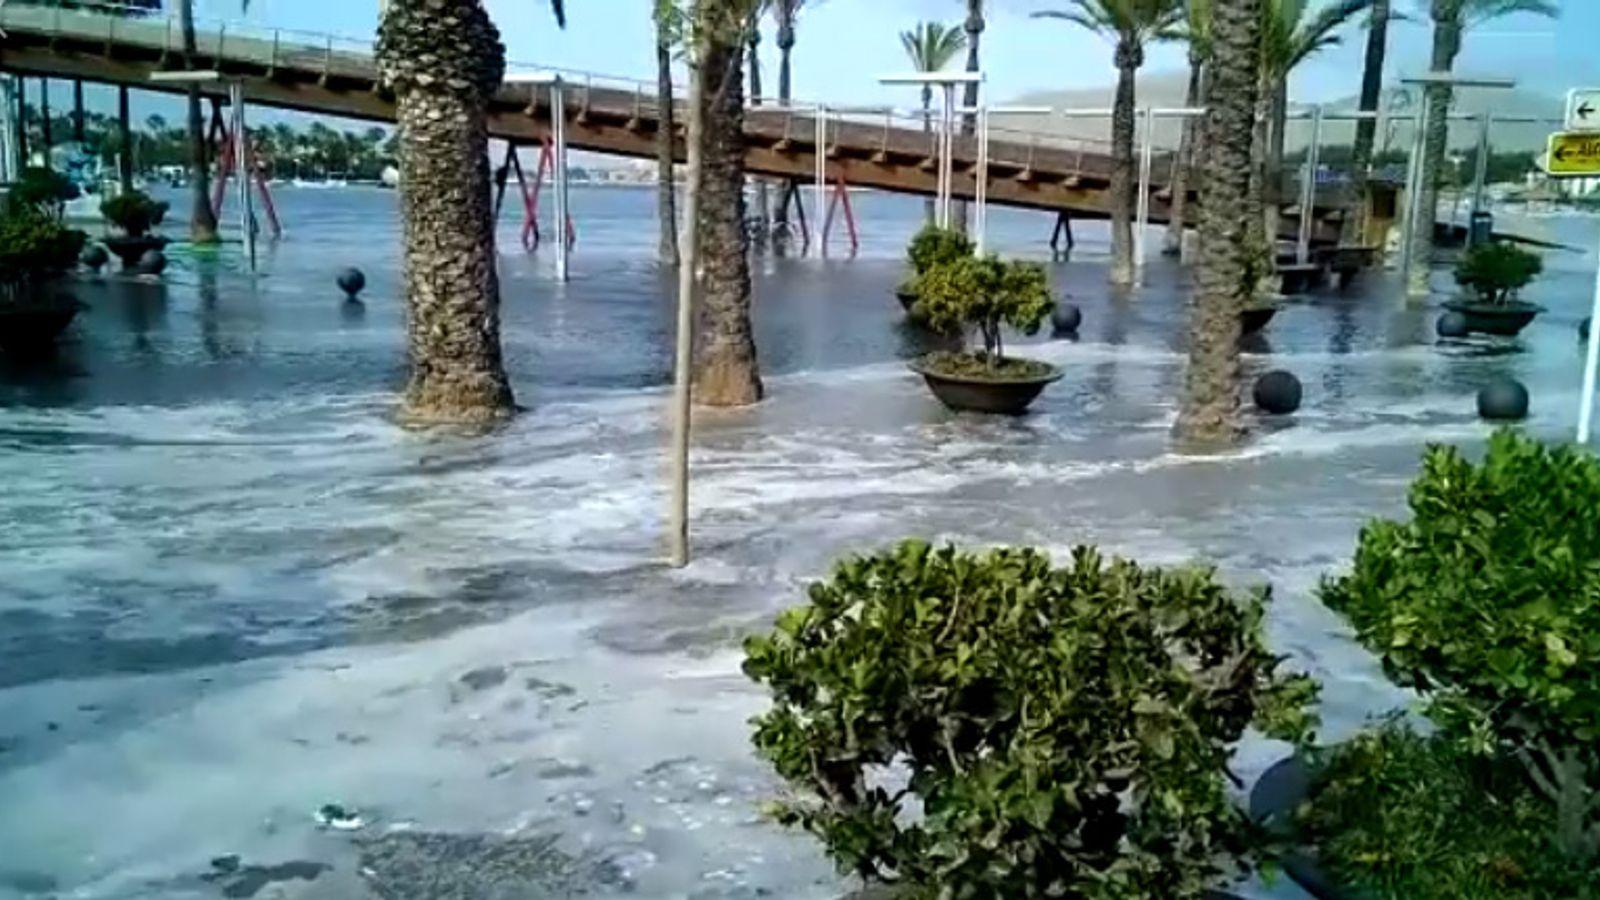 MiniTsunamiHitsMajorcaAndMenorcaFloodingBeachesAndRestaurants